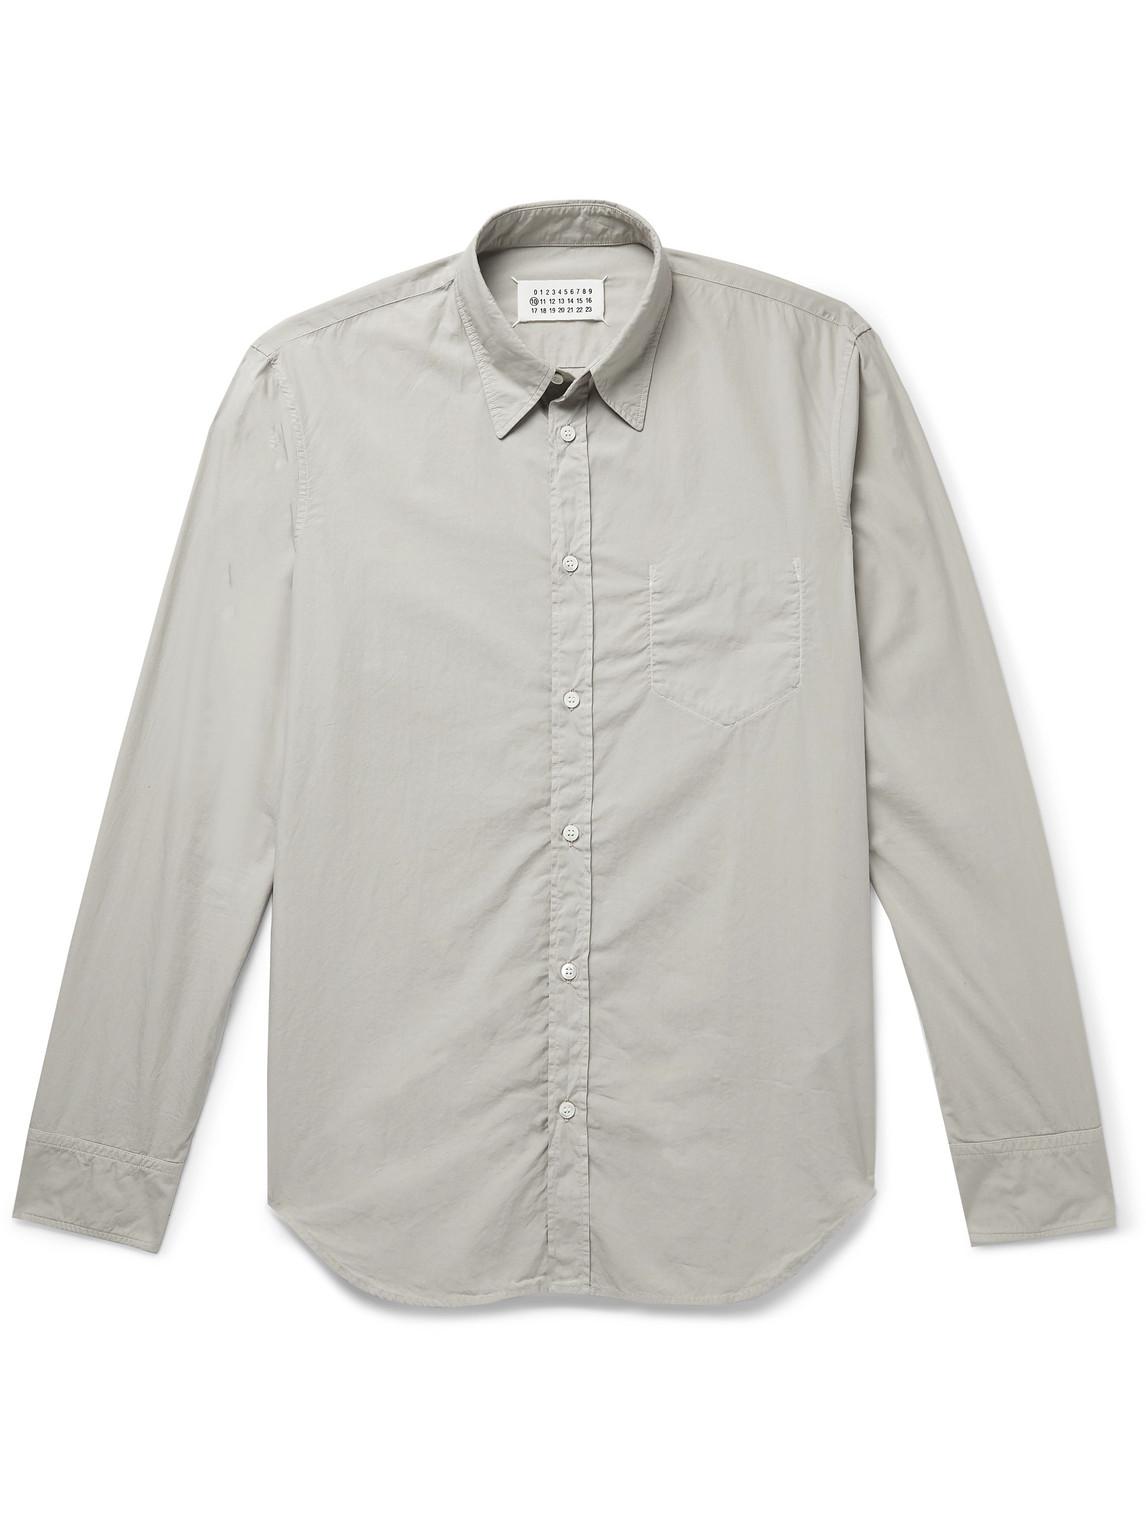 maison margiela - slim-fit garment-dyed cotton-poplin shirt - men - brown - eu 42